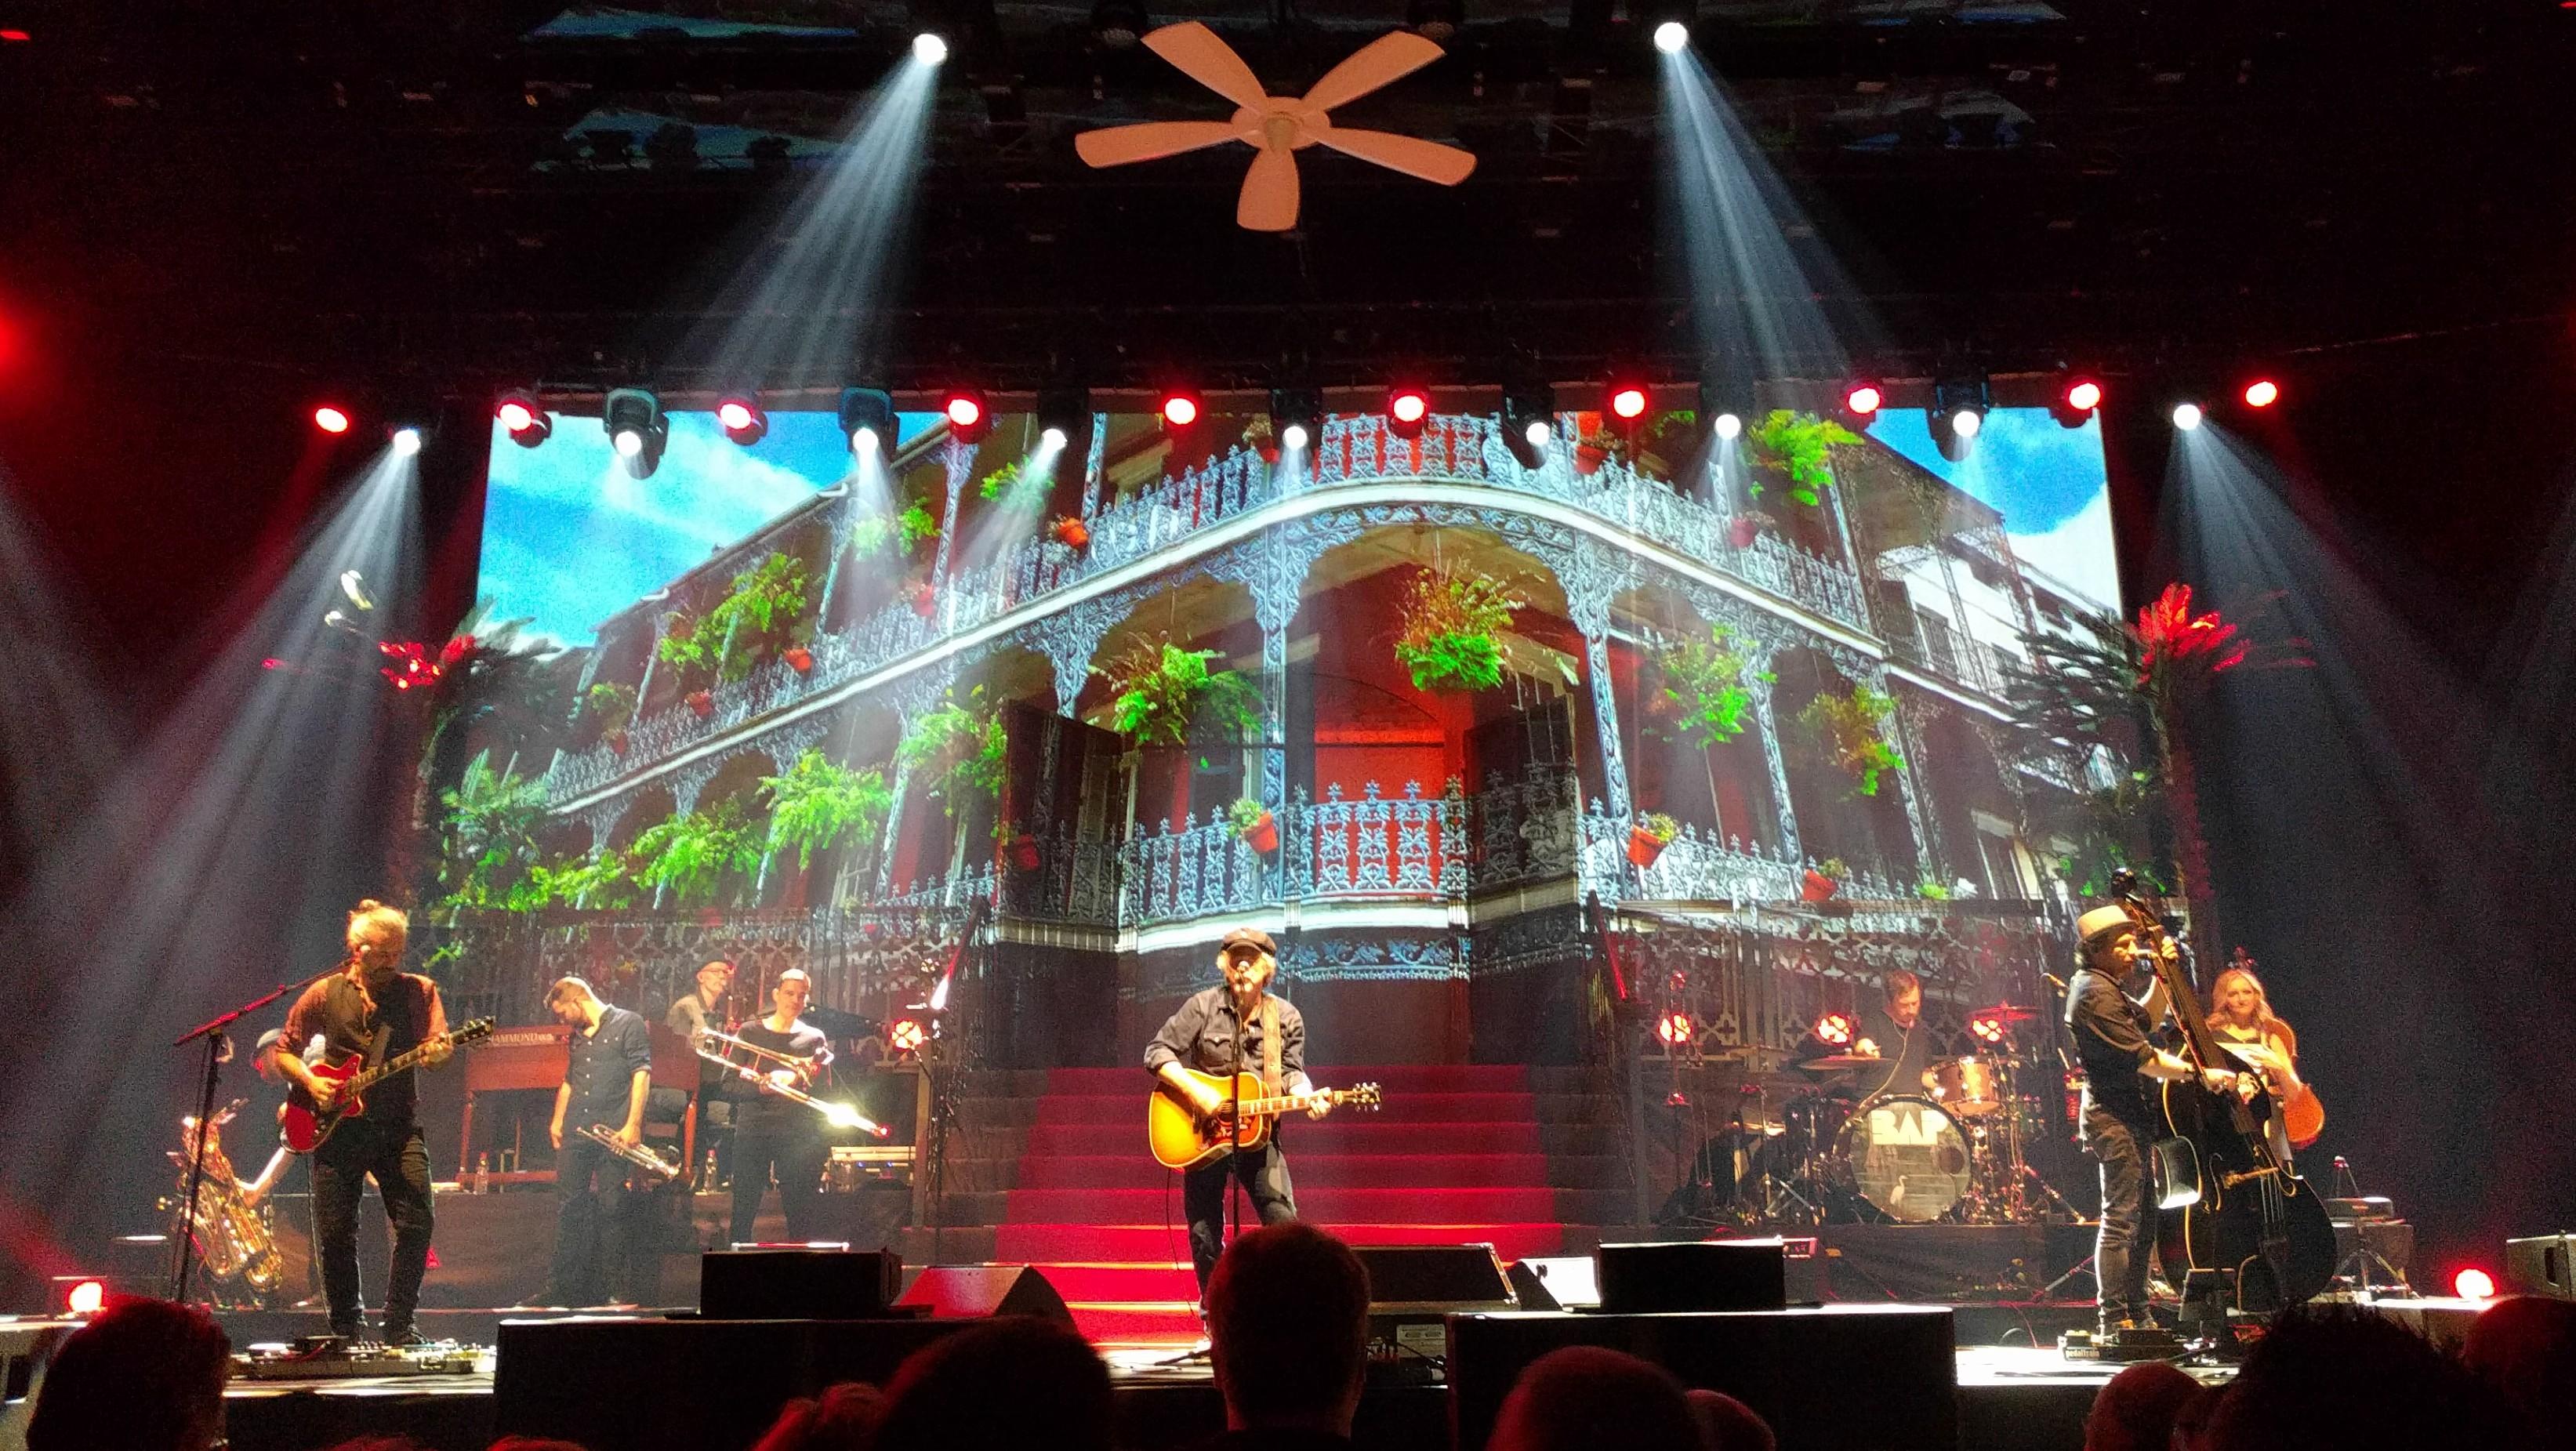 2. Oktober 2018: NiedeckensBAP live in Karlsruhe